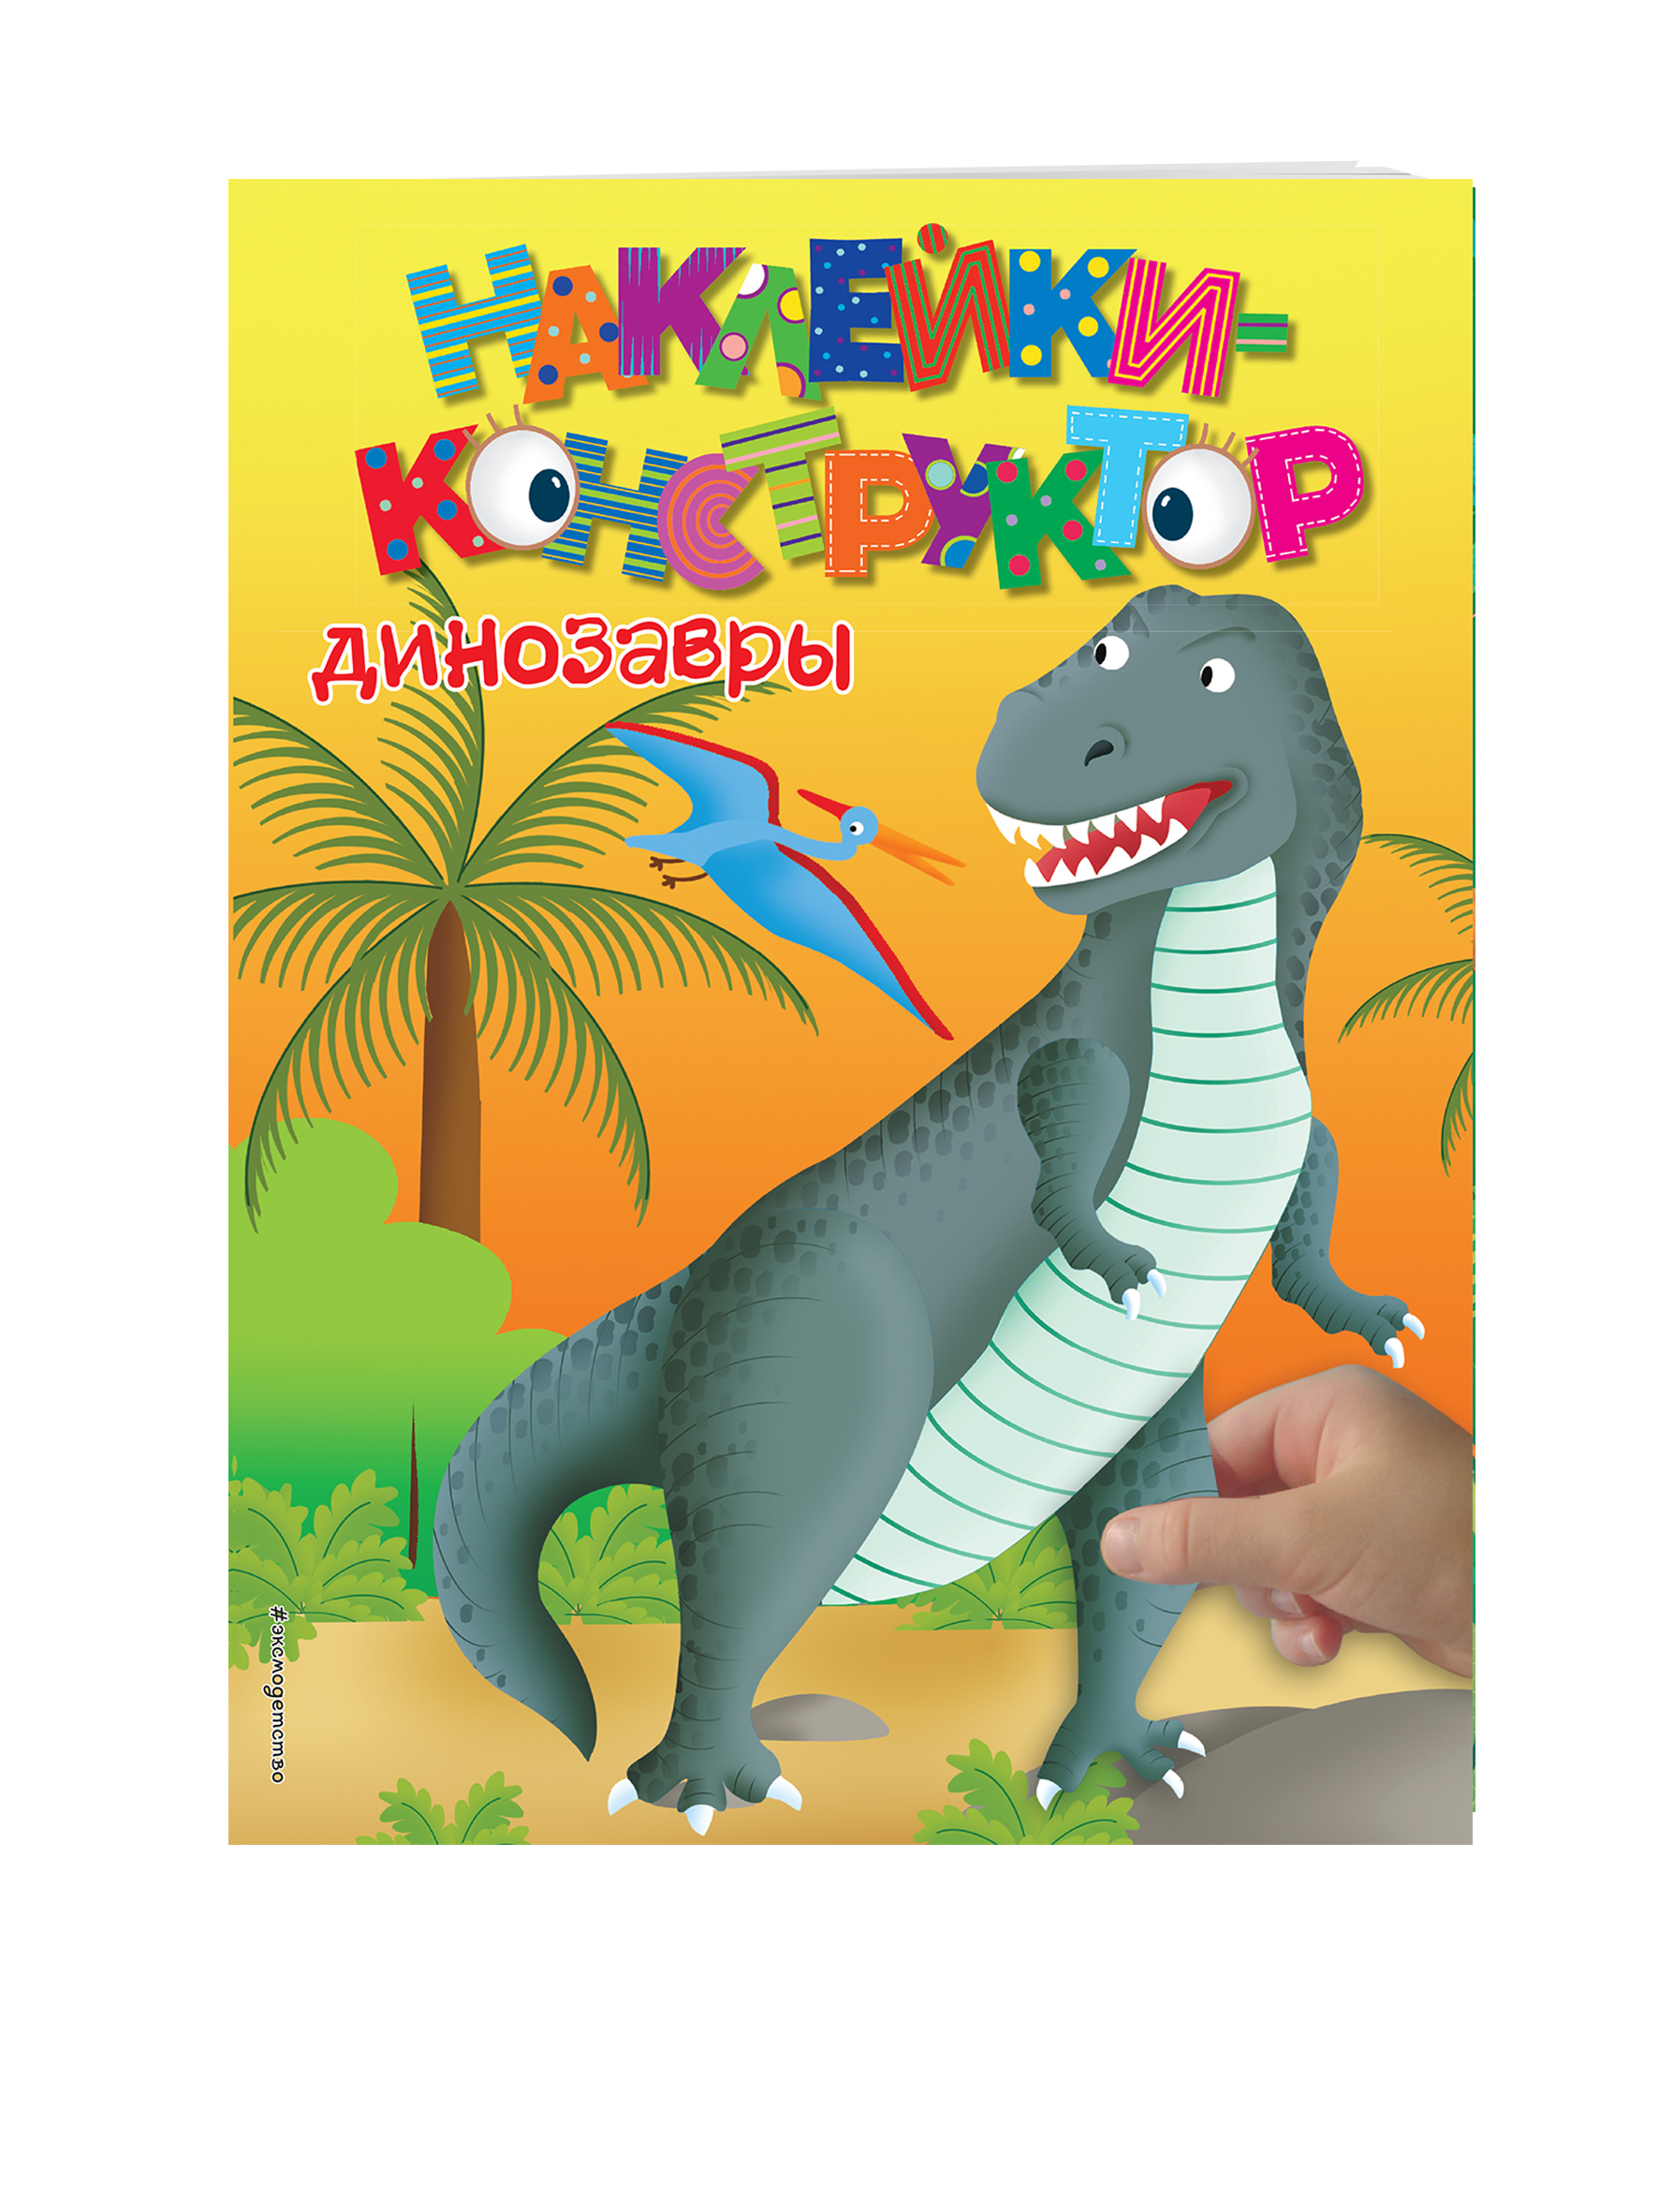 Динозавры (Х5) ISBN: 978-5-699-97634-8